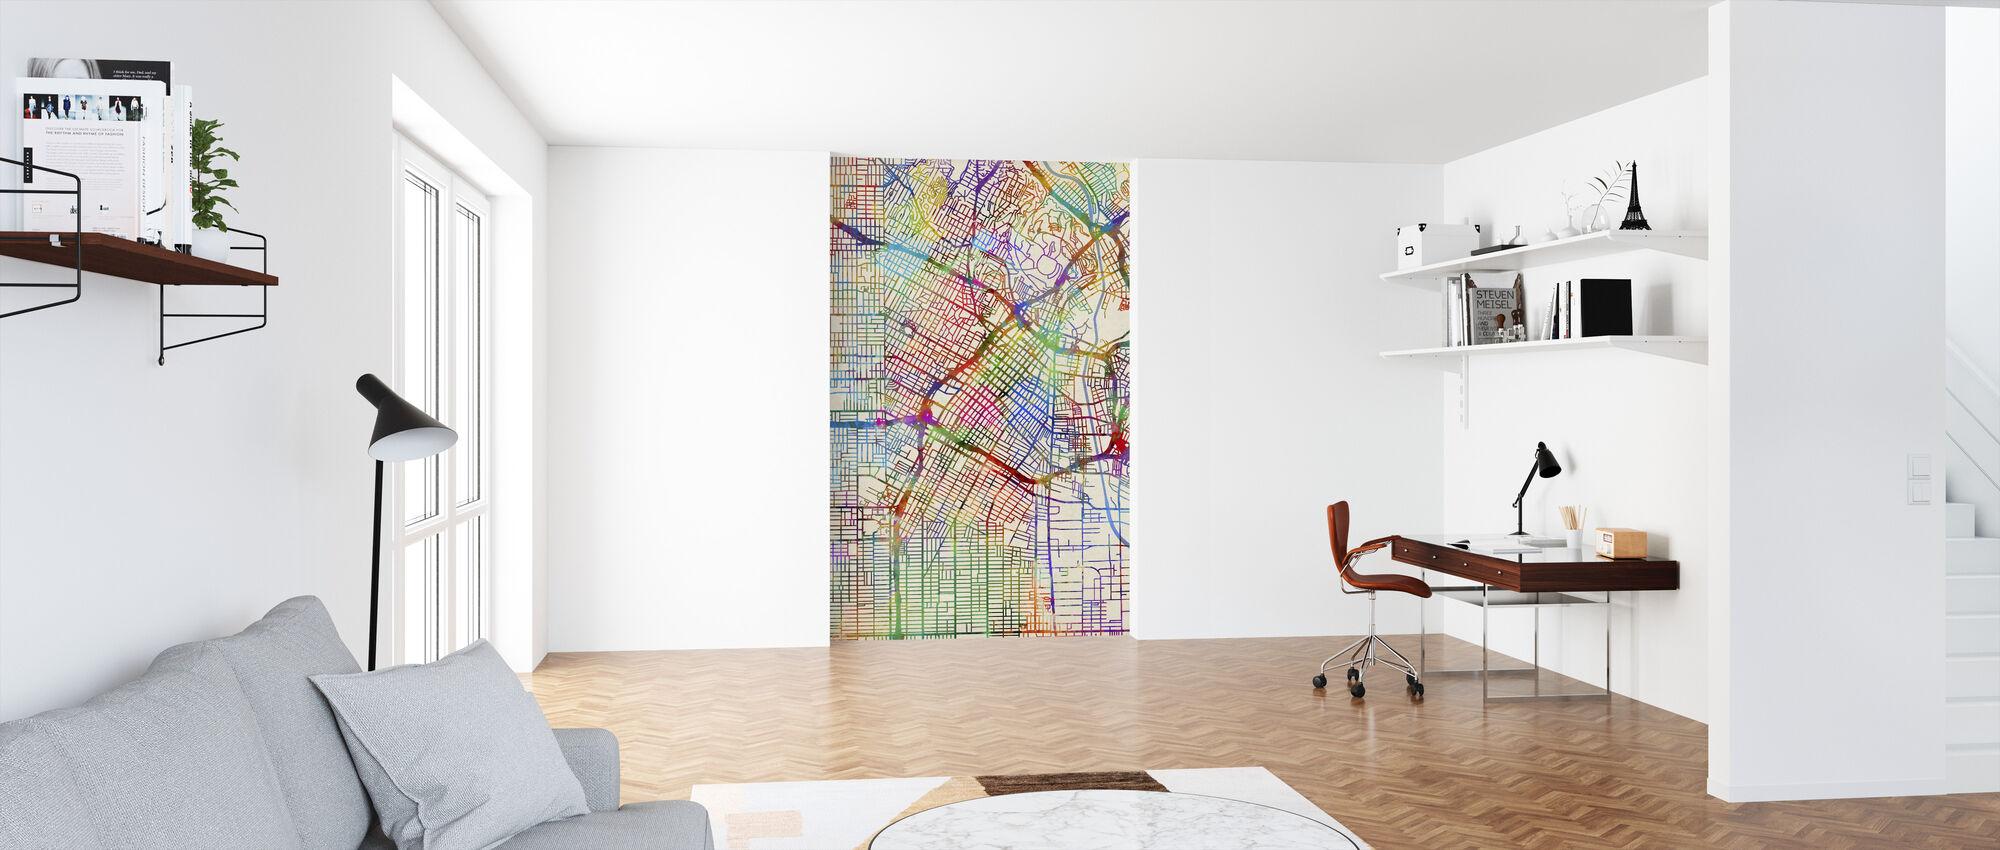 Los Angeles City Street Map - Wallpaper - Office